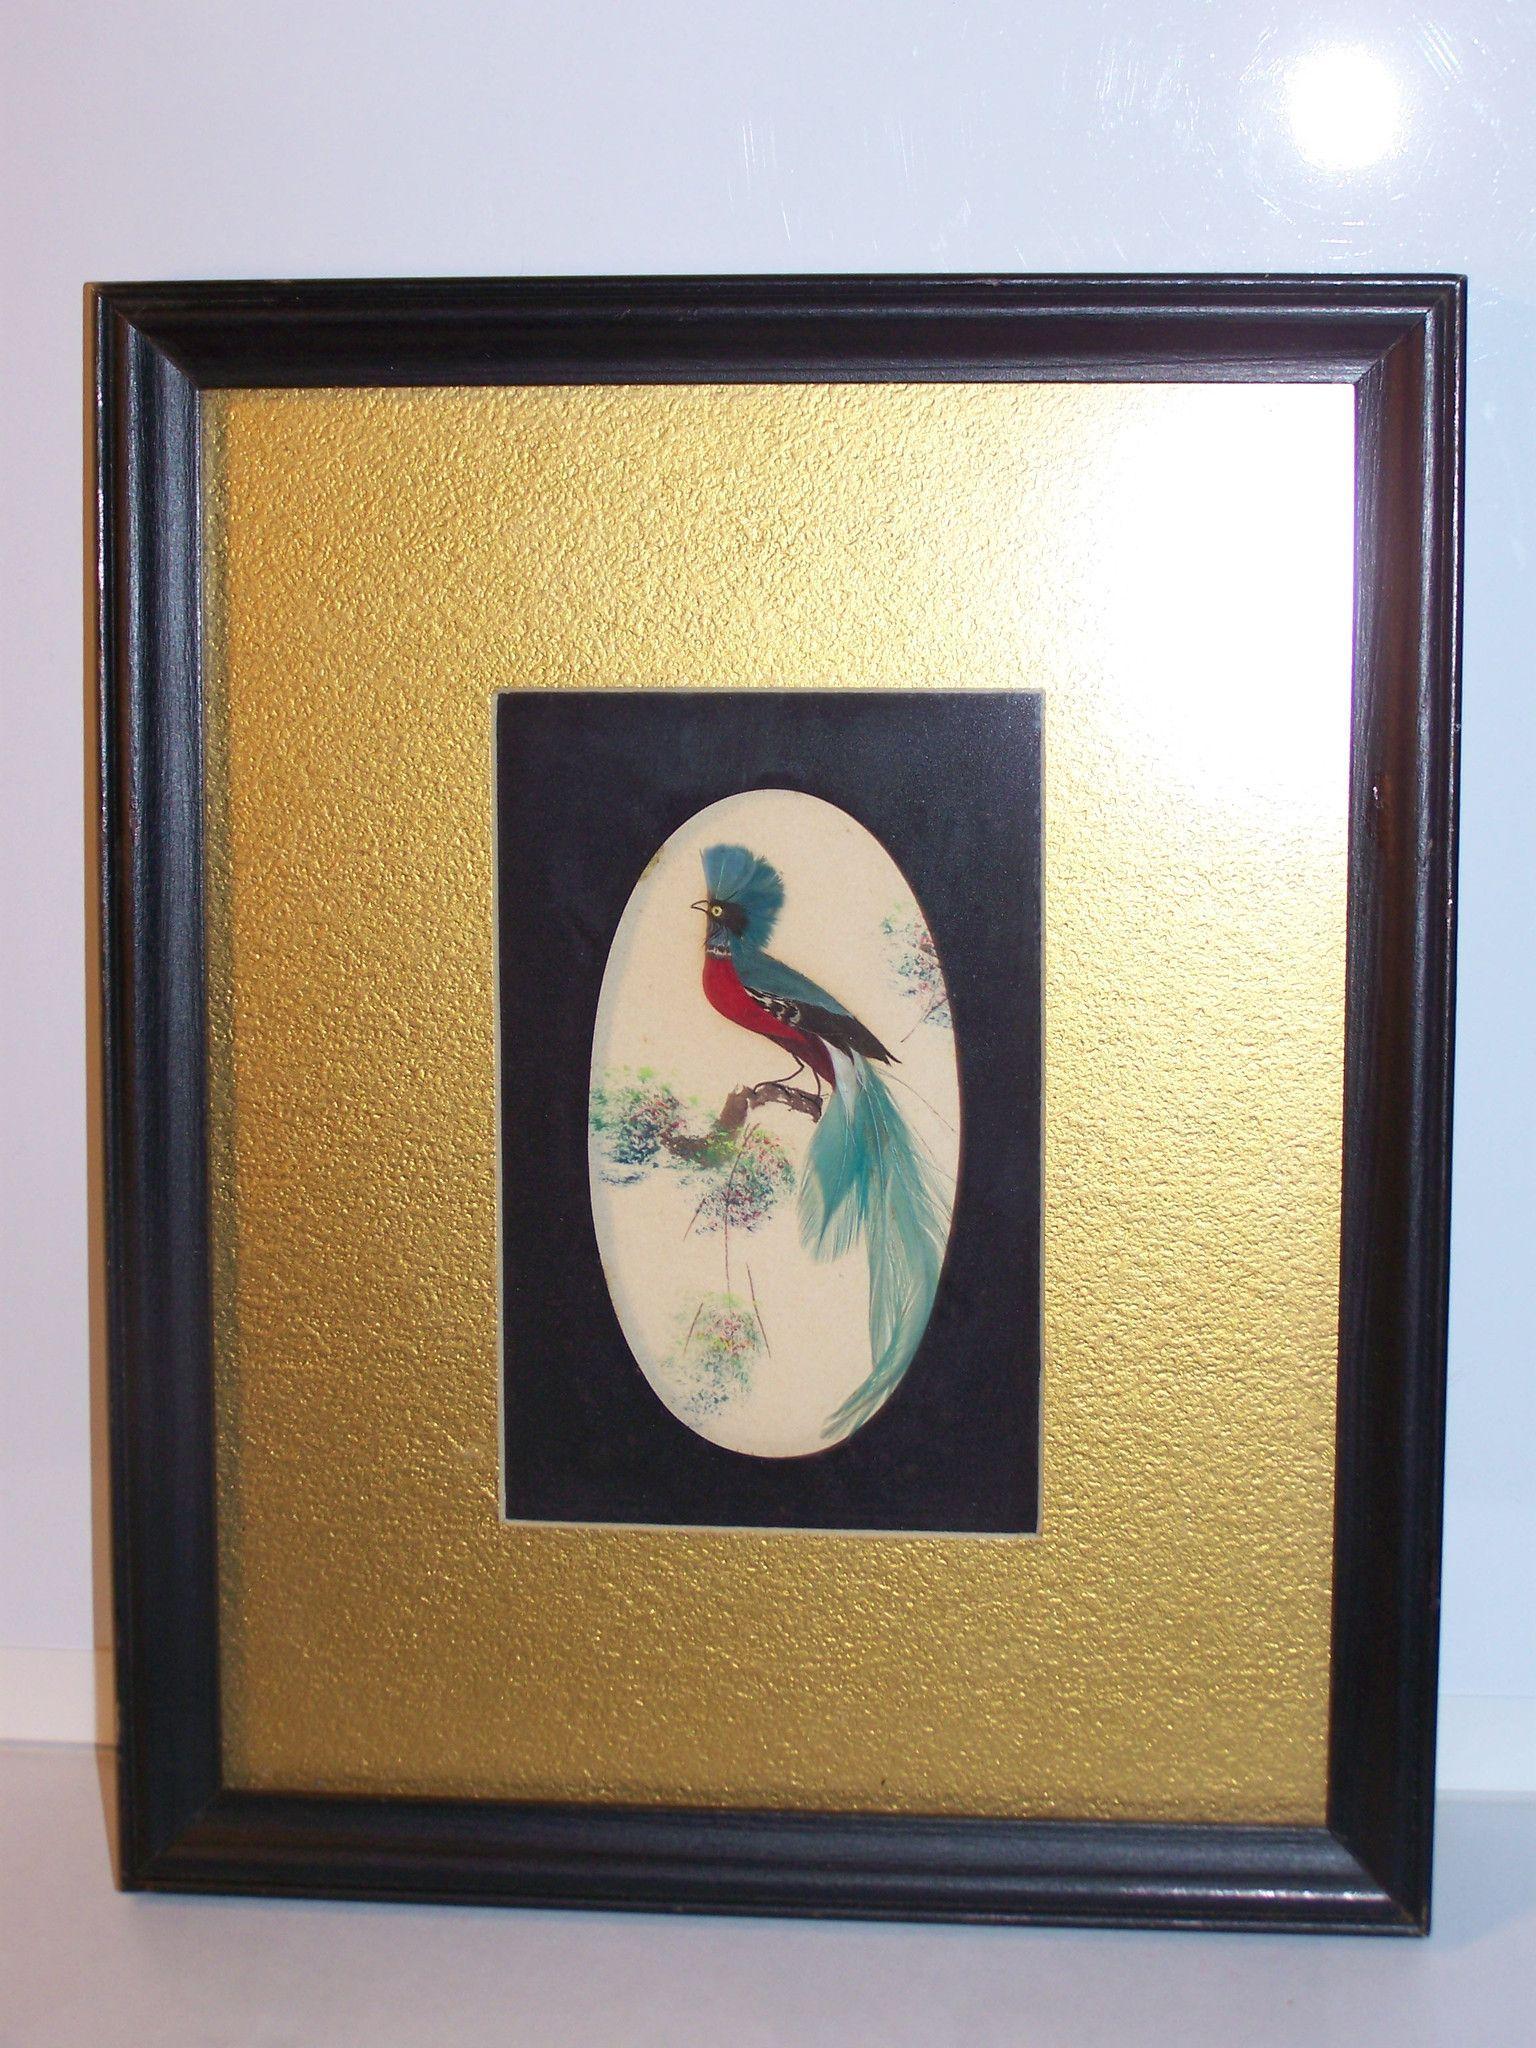 Framed dbl mat feather bird painting vintage (frame 9.5x11.5 ...